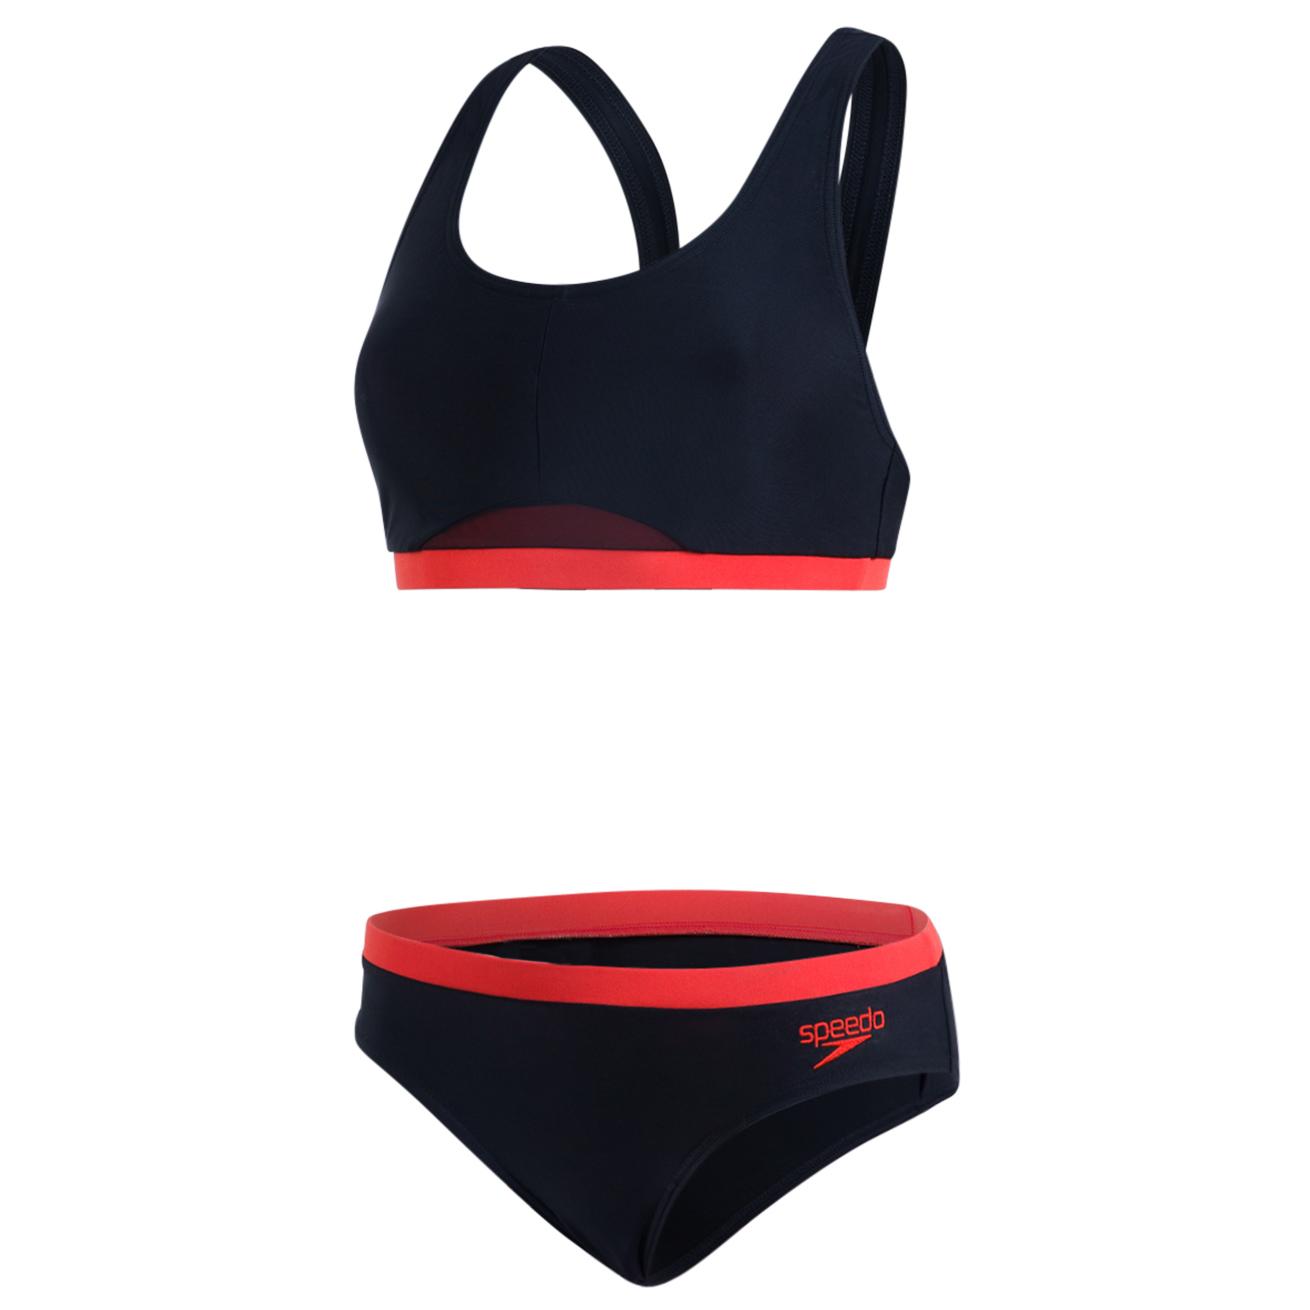 3e6d36ef Speedo Hydractive 2 Piece - Bikini Women's | Buy online | Alpinetrek.co.uk